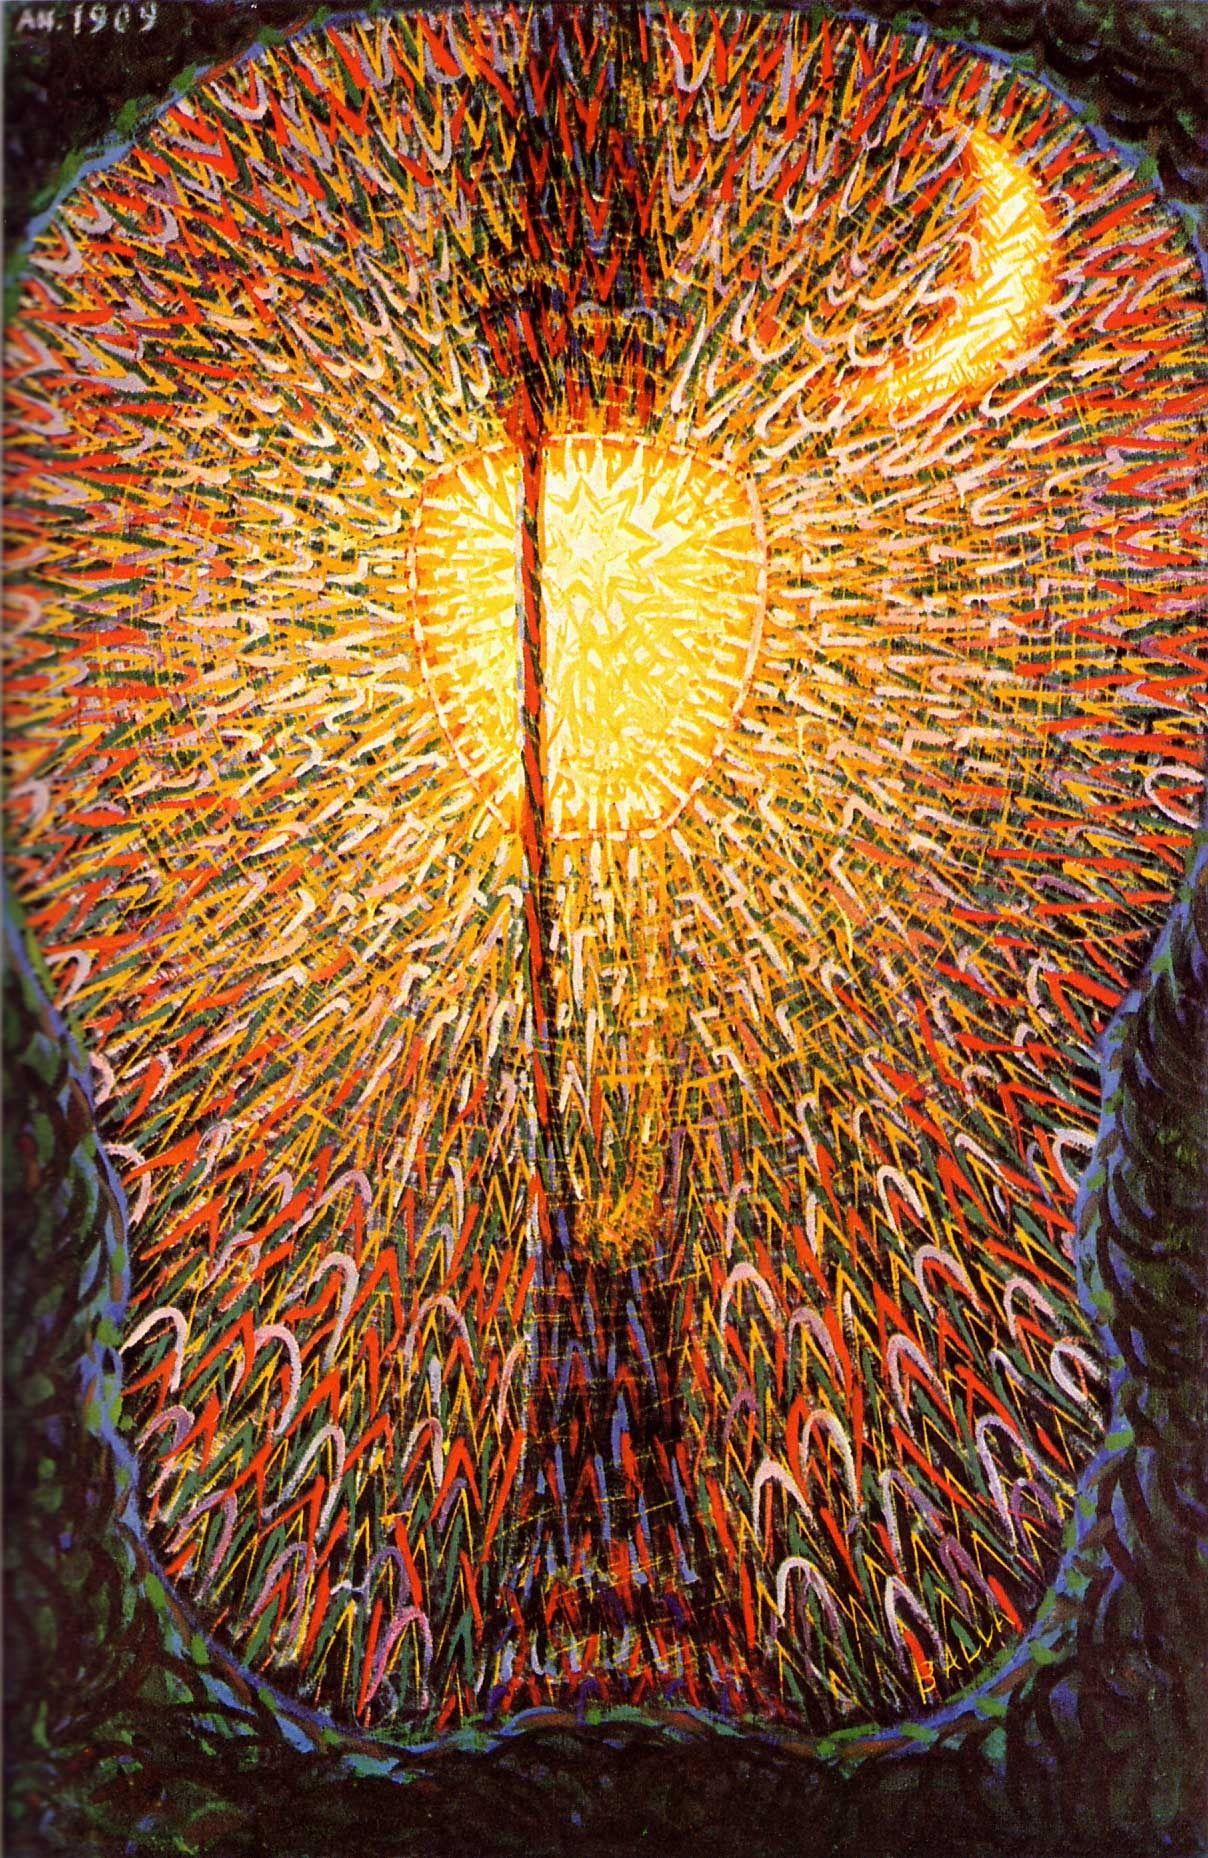 Giacomo Balla - Lampada ad arco - 1909 - Museum of Modern Art - NY ...